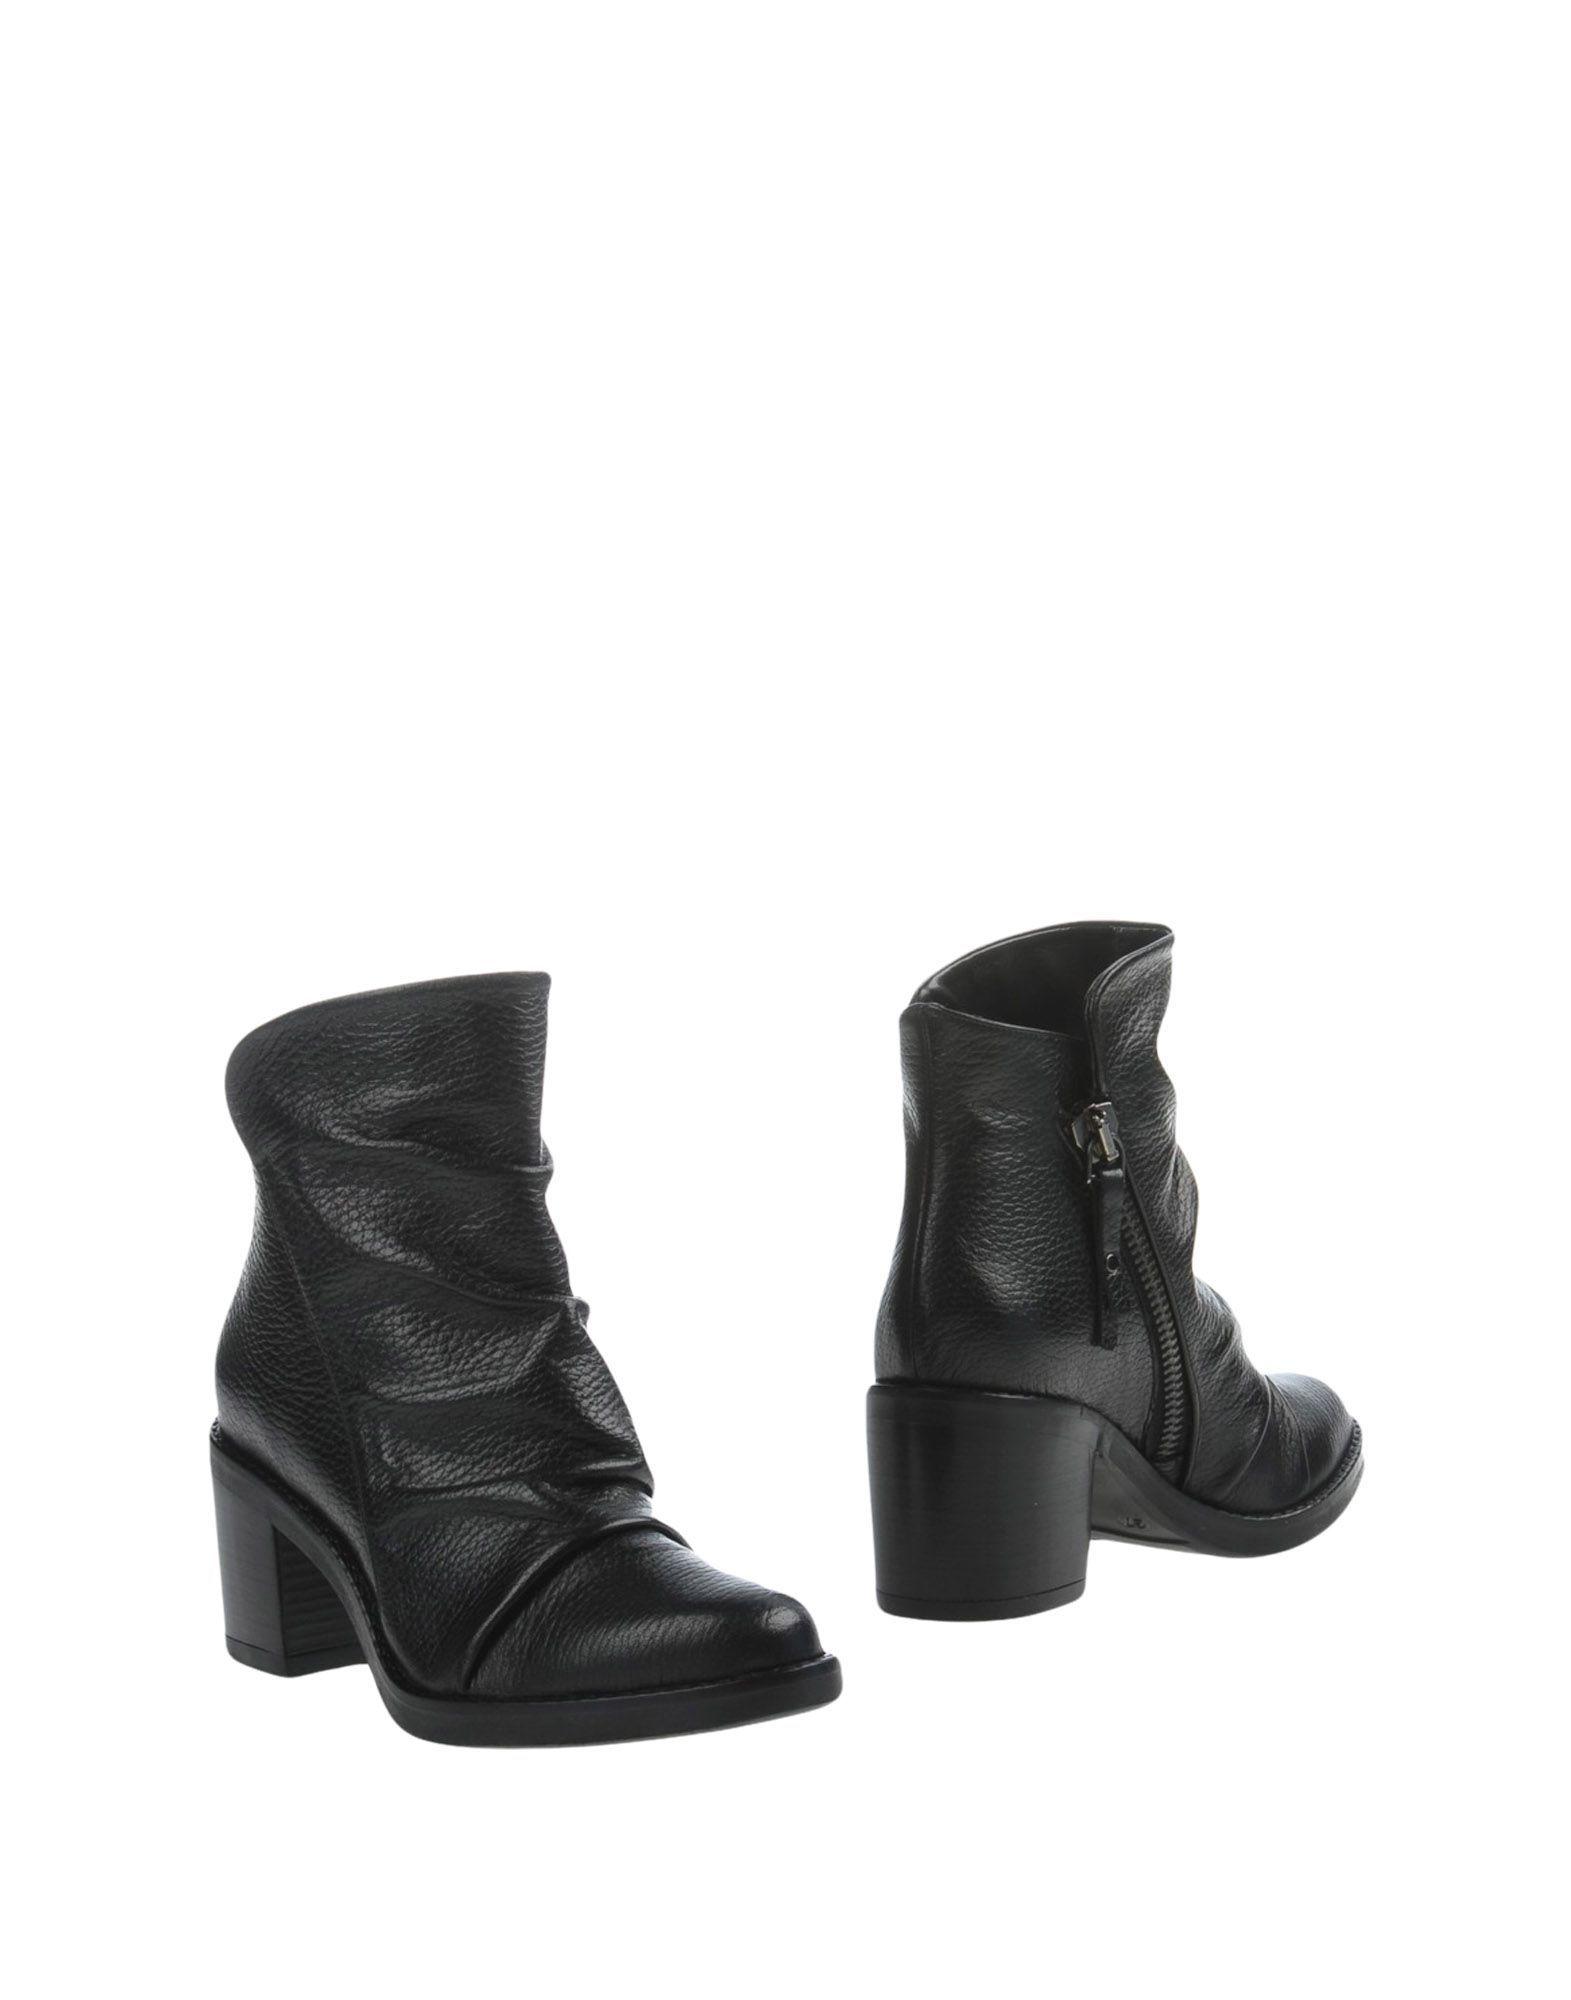 Marra Women US 11 Black Ankle Boot